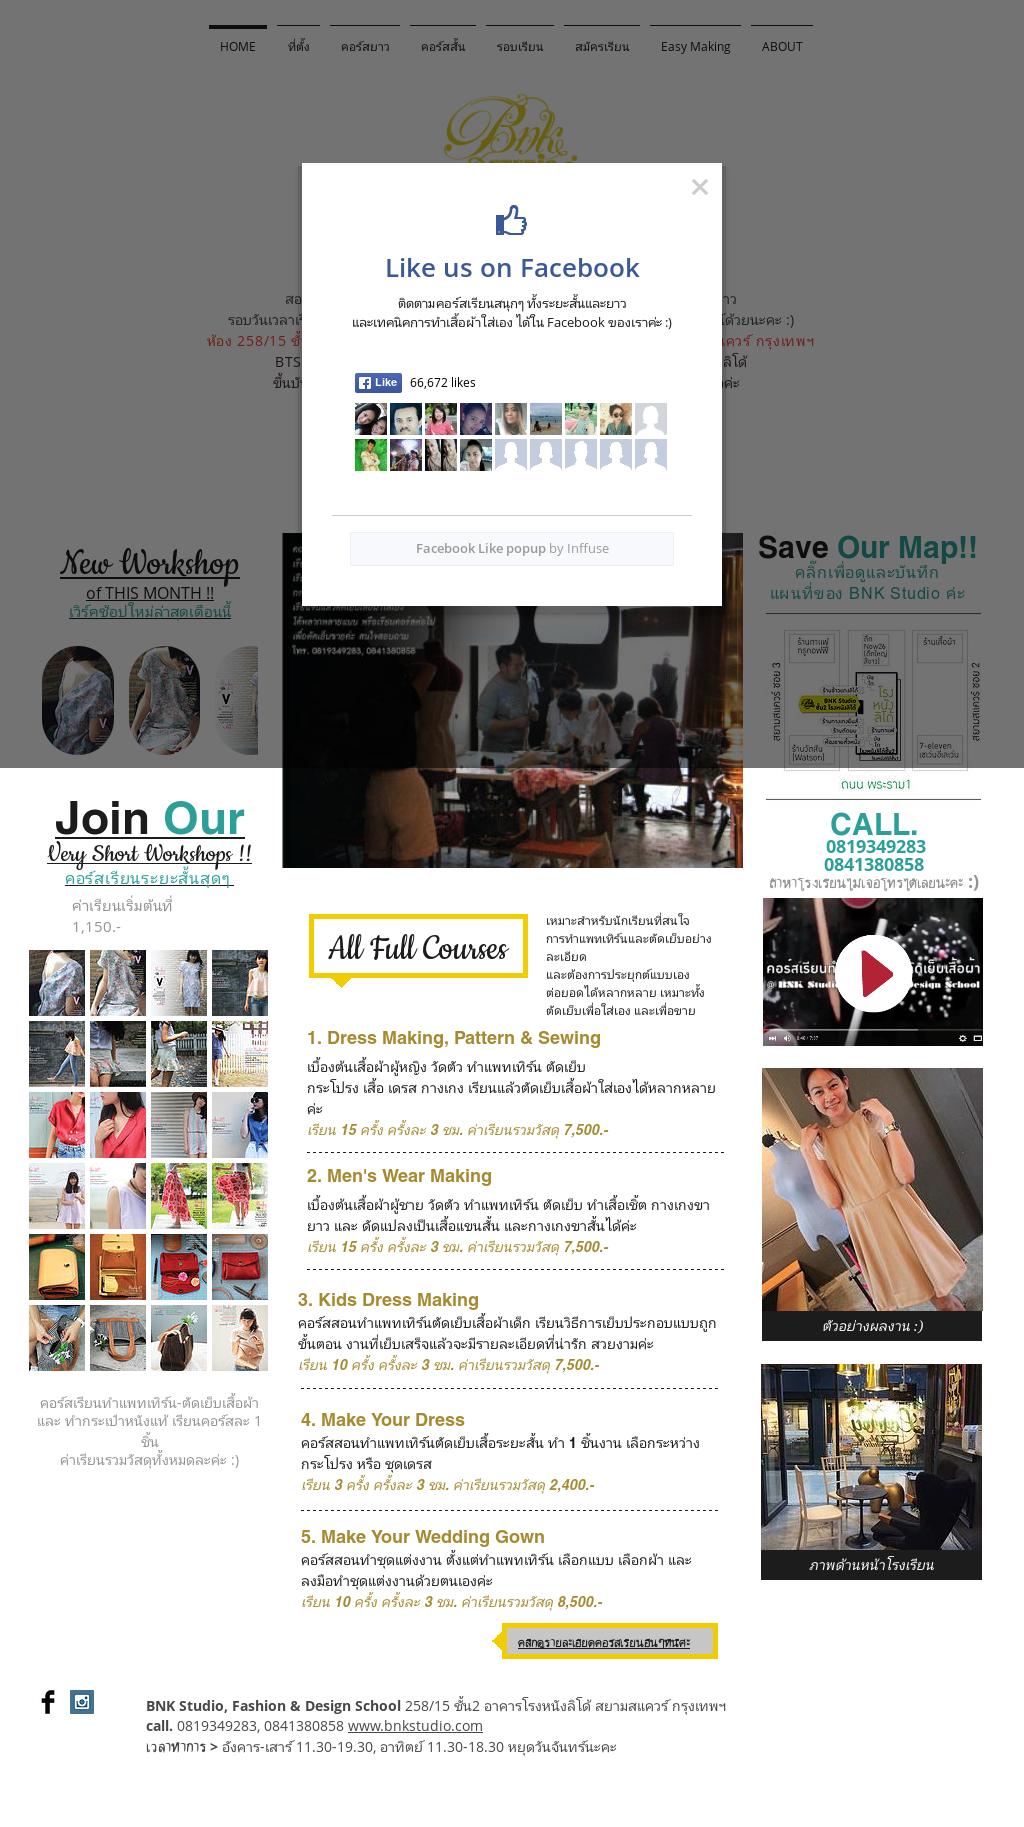 Bnk Studio Fashion And Design School Competitors Revenue And Employees Owler Company Profile